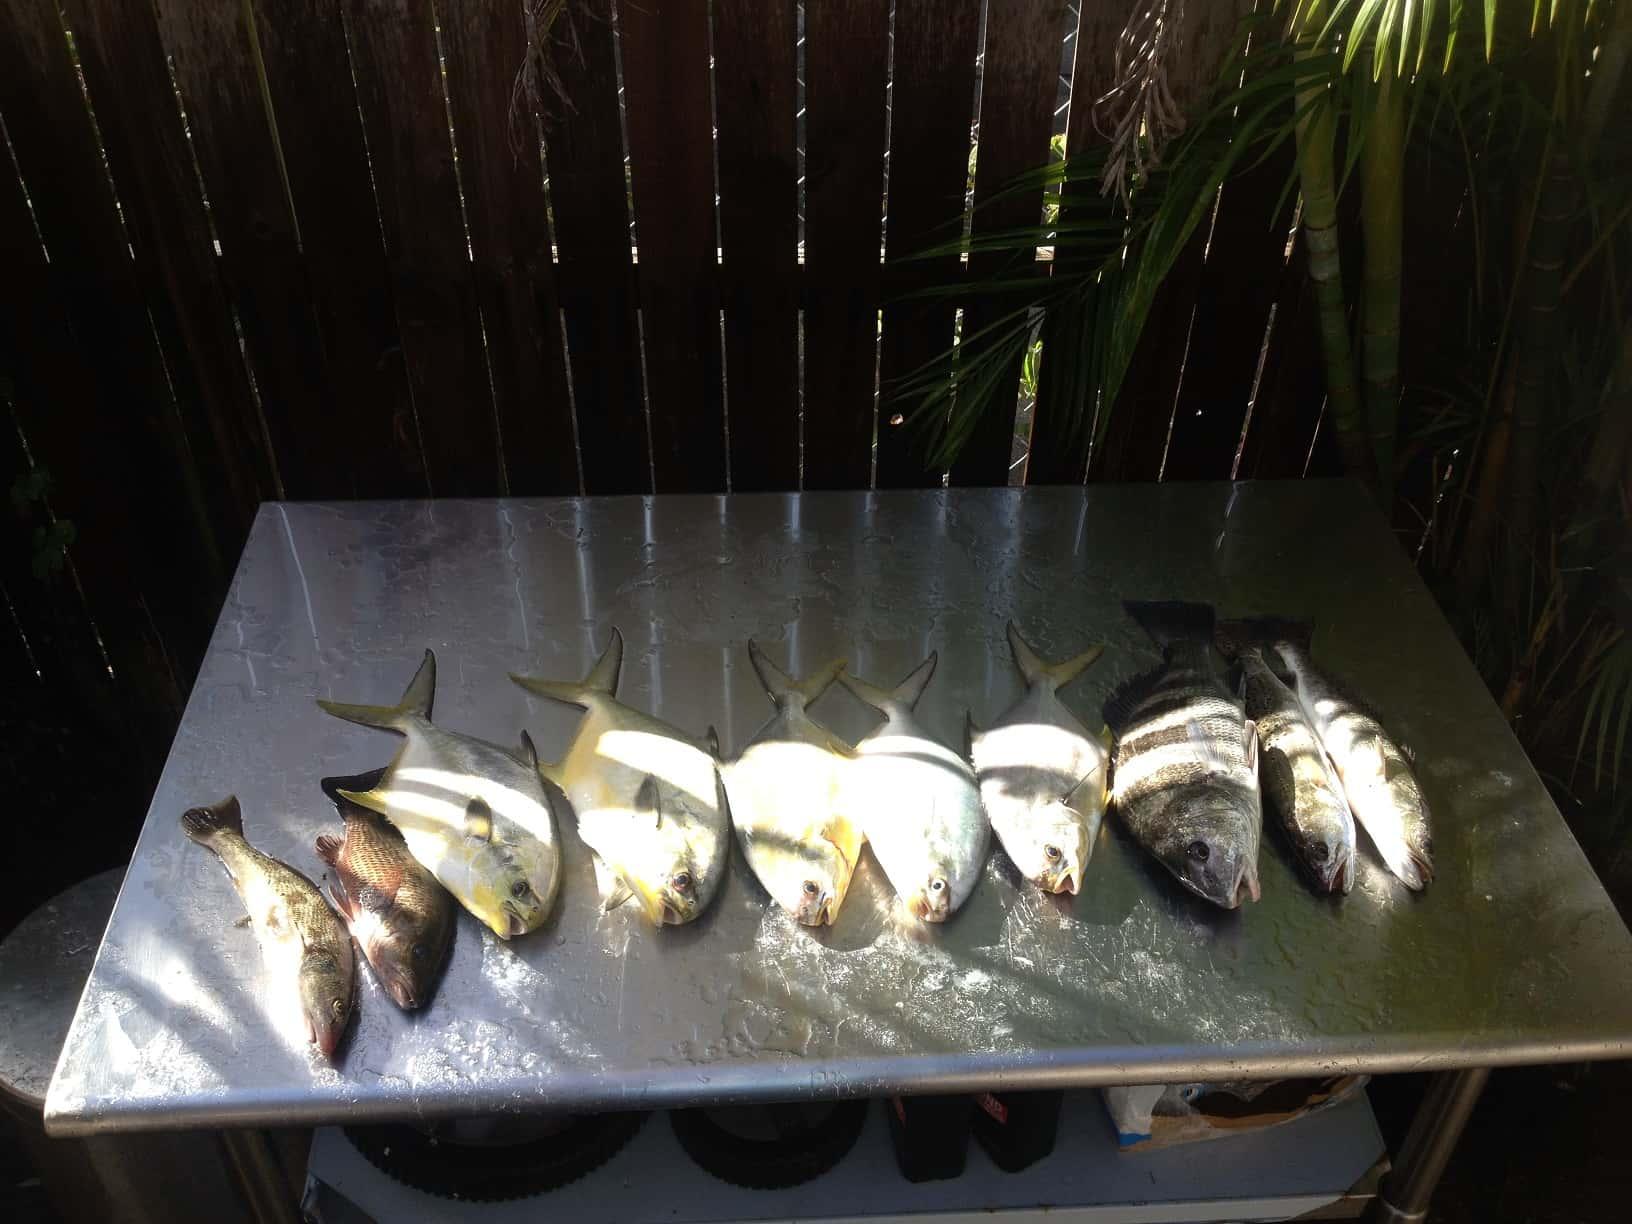 Permit pompano tarpon cobia in tampa bay in november for Whiting fish florida